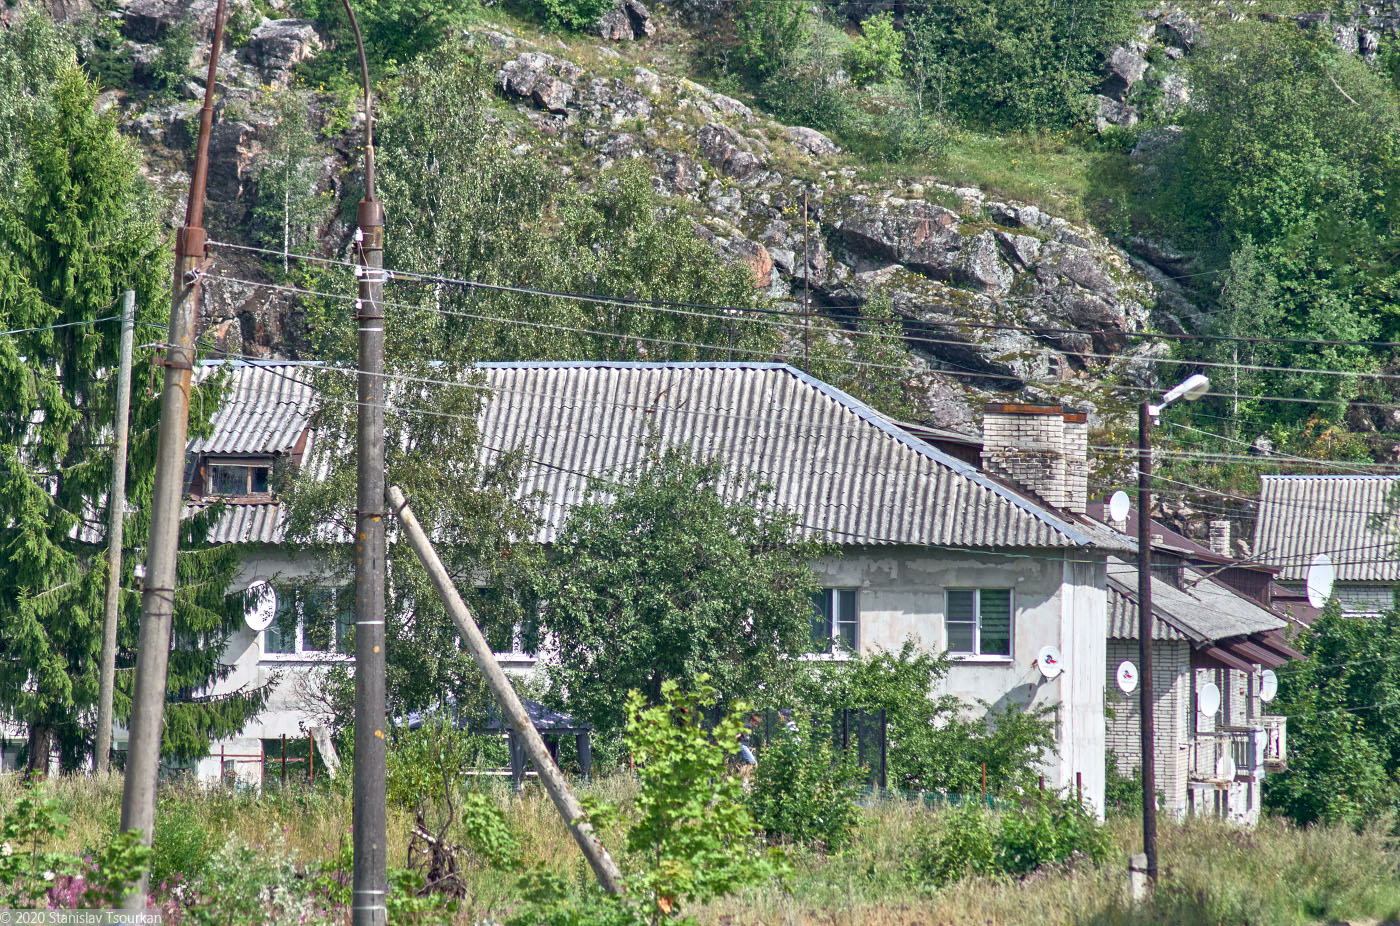 Карелия, республика Карелия, Сортавала, russia, karjala, sortavala, гора Кухавуори